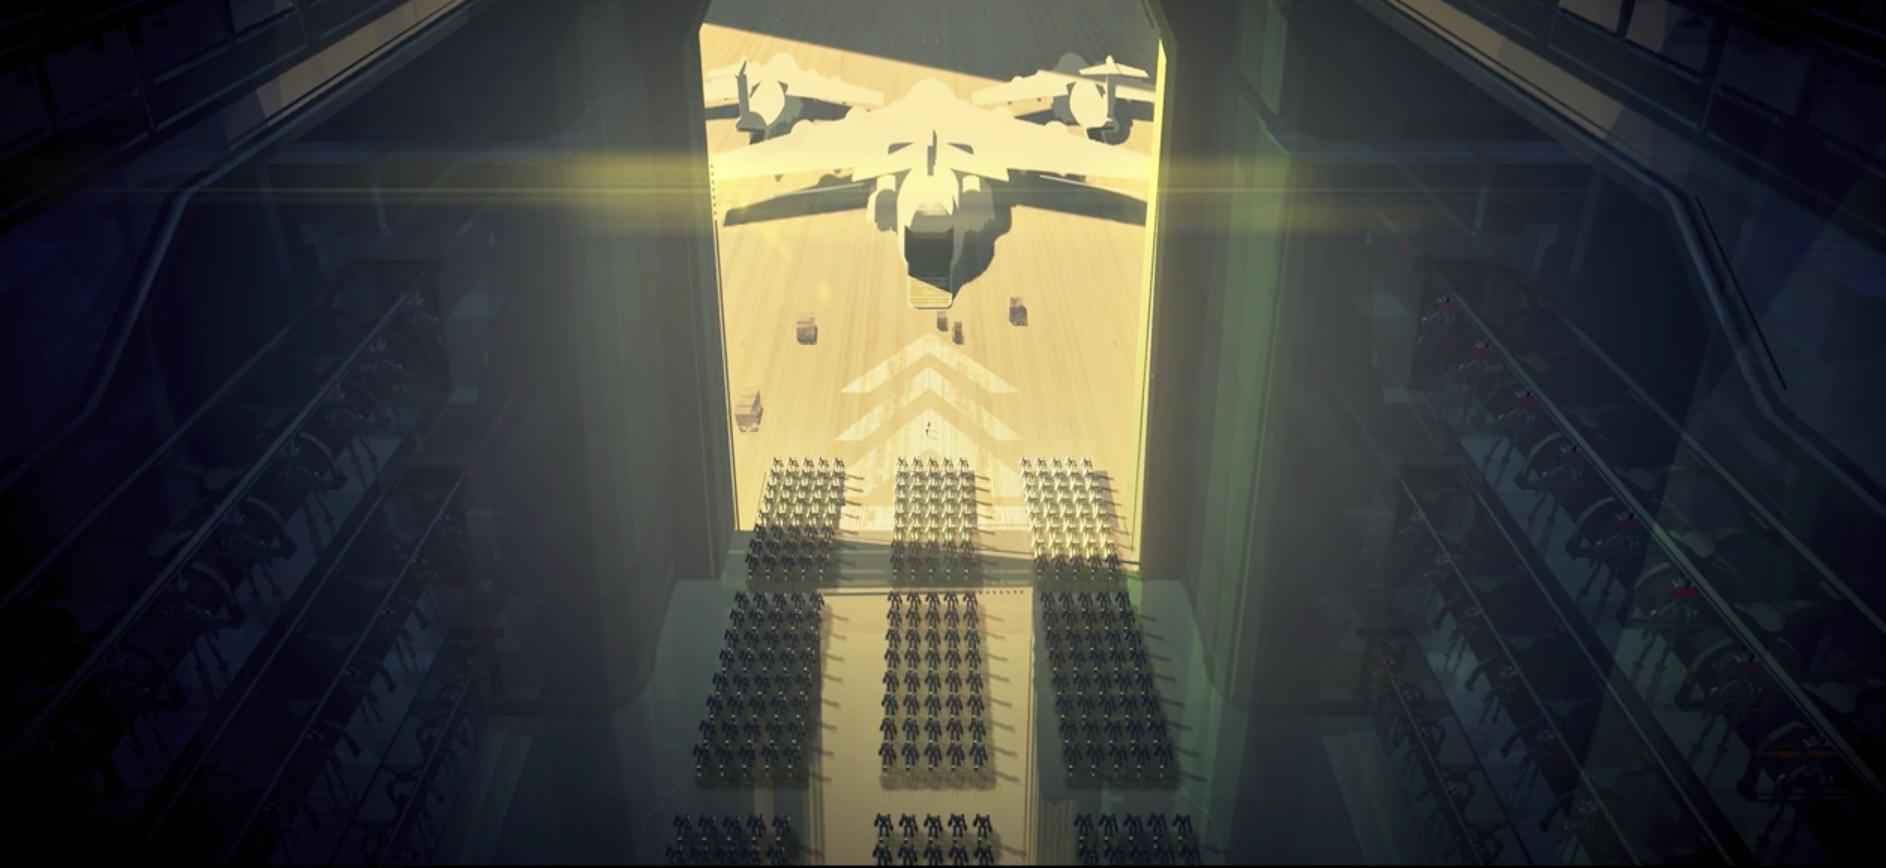 Above shot of a hangar full of robots